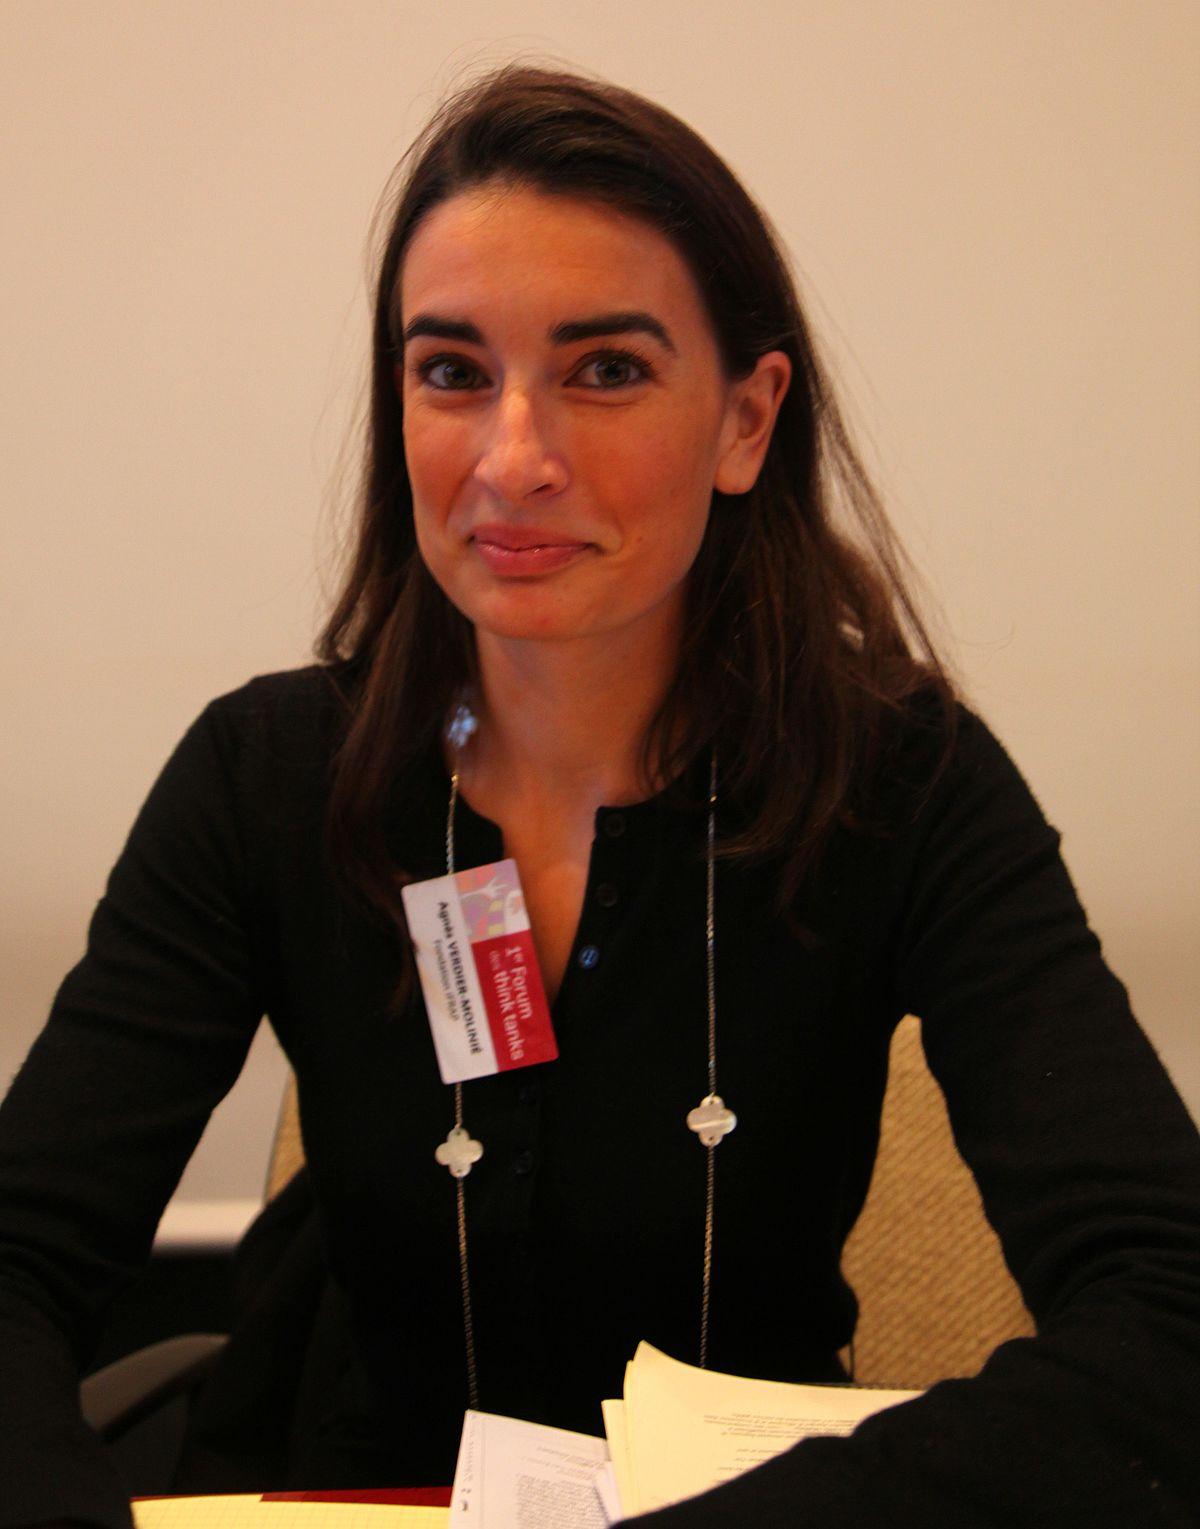 Sylvie Un Peu De Tendresse